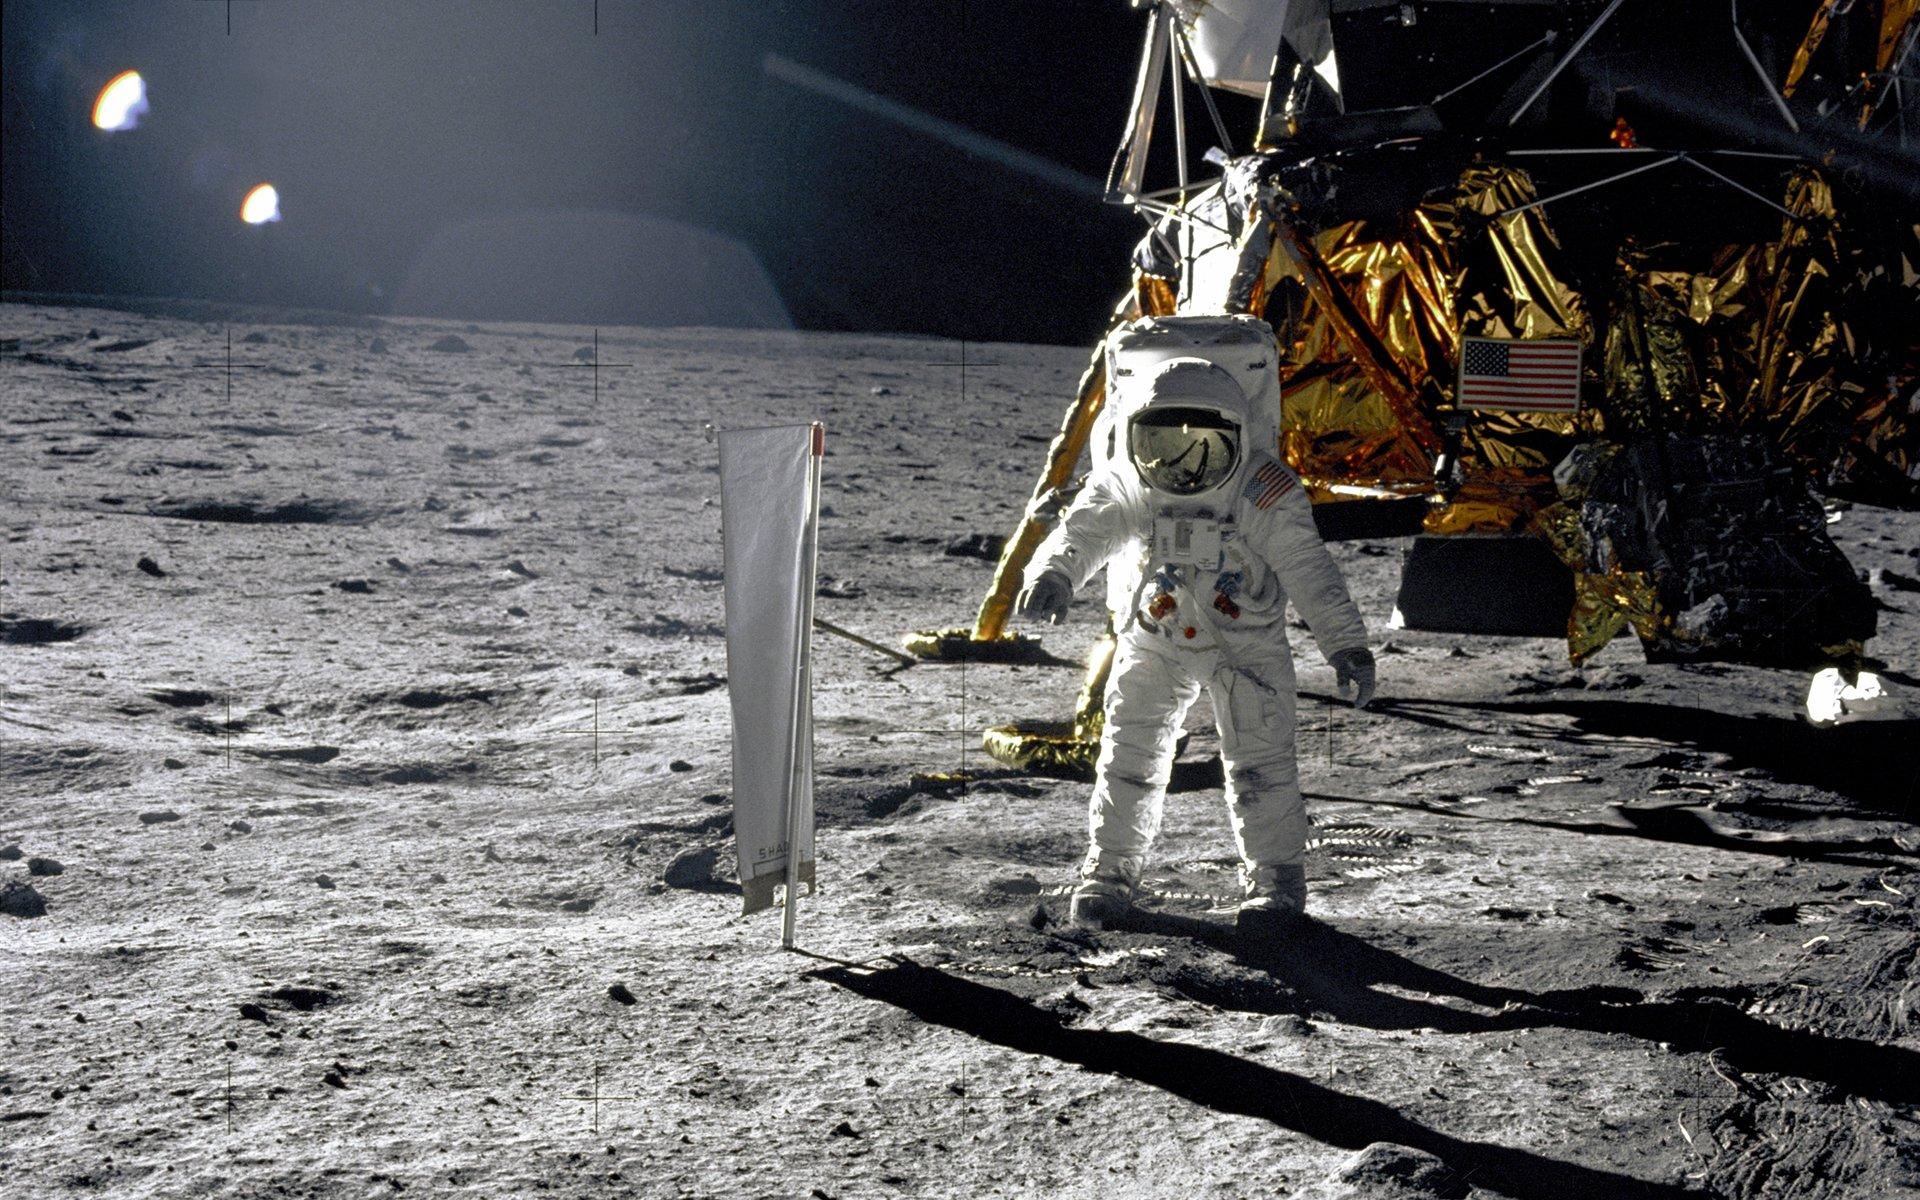 Free Download Man On The Moon Apollo Desktop Wallpaper 1920x1200